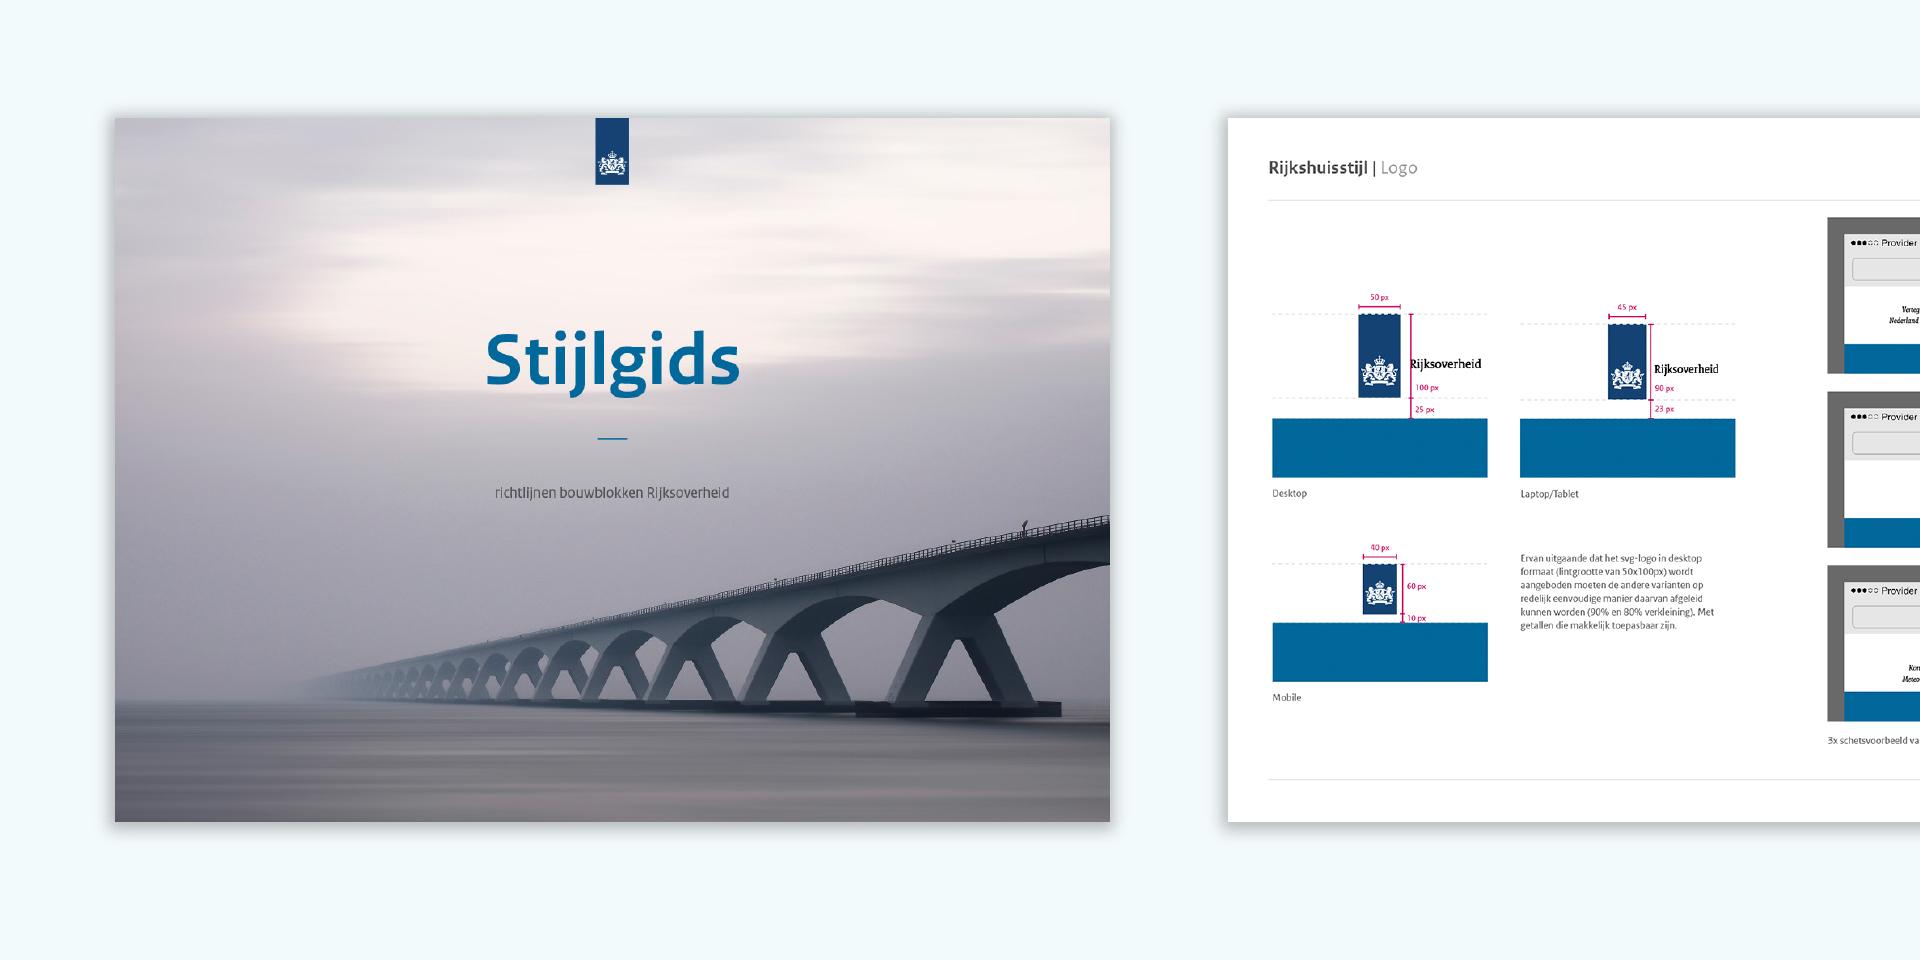 Rijksoverheid. Designtaal voor Digitaal stijlgids – Dutchgiraffe | Digital Creatives